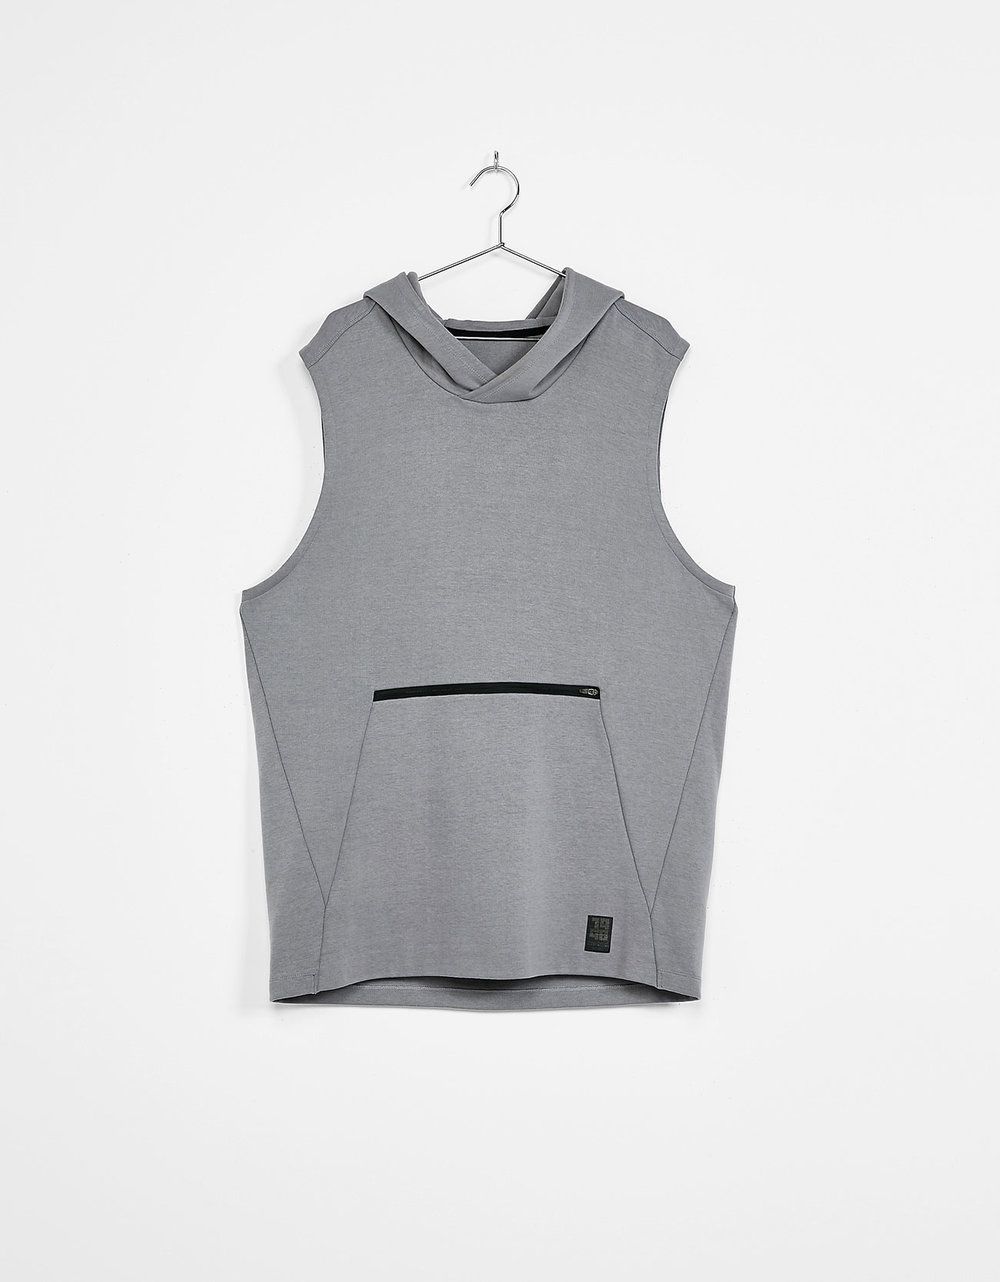 Hooded plush sport waistcoat, £22.99